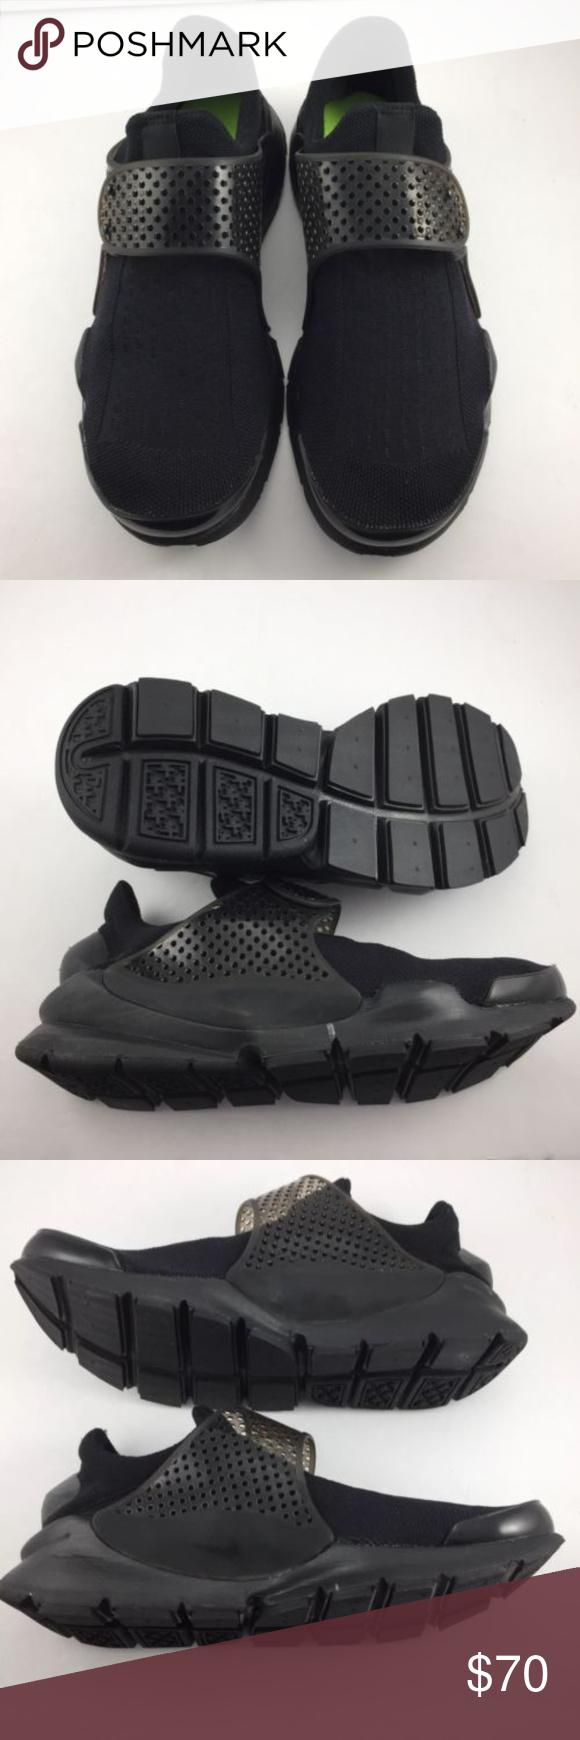 huge discount 225bb 2ac90 Nike Sock Dart MENS Sz 7 819686-001 ITEM  NIKE SOCK DARTS TRIPLE BLACK